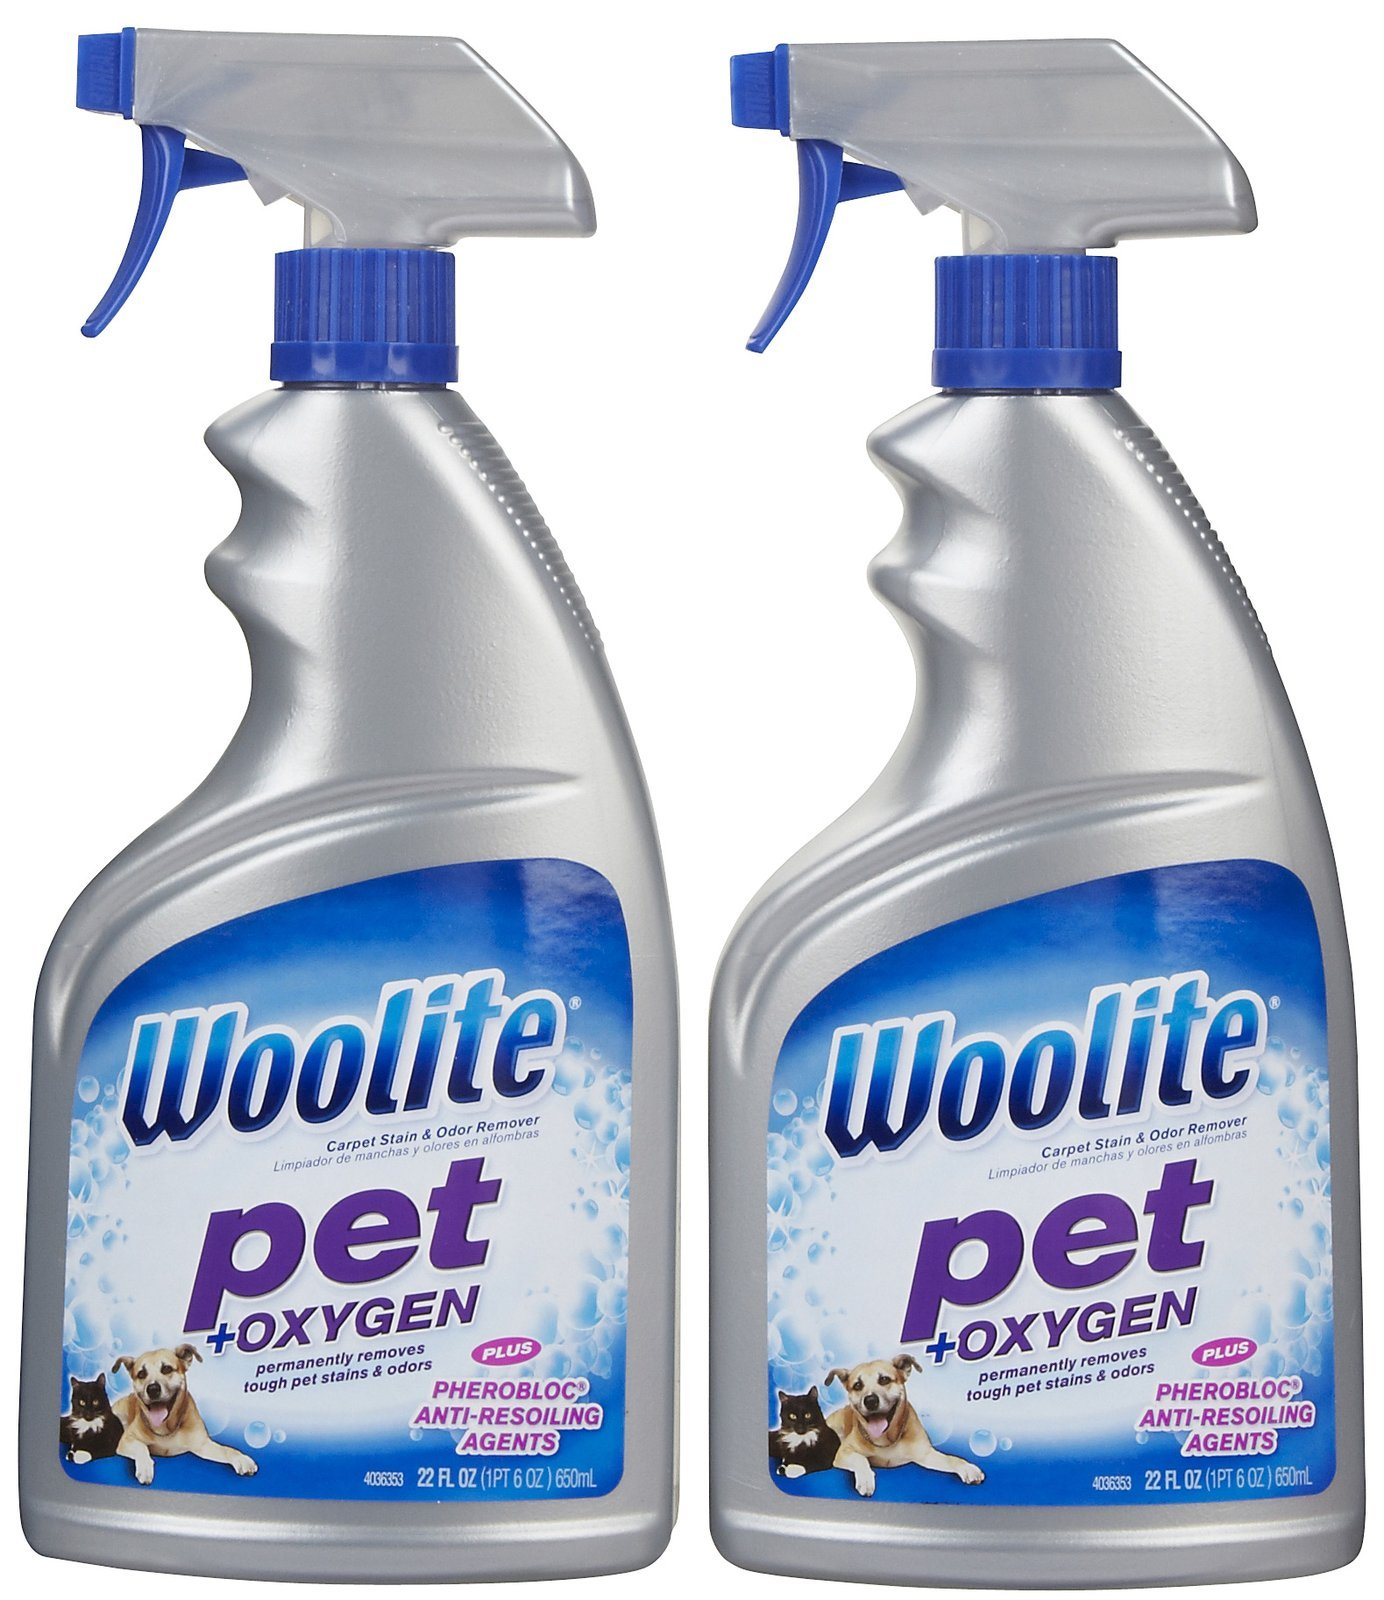 Woolite Pet Stain & Odor Remover Carpet Cleaner + Oxygen, 22 oz-2 pk